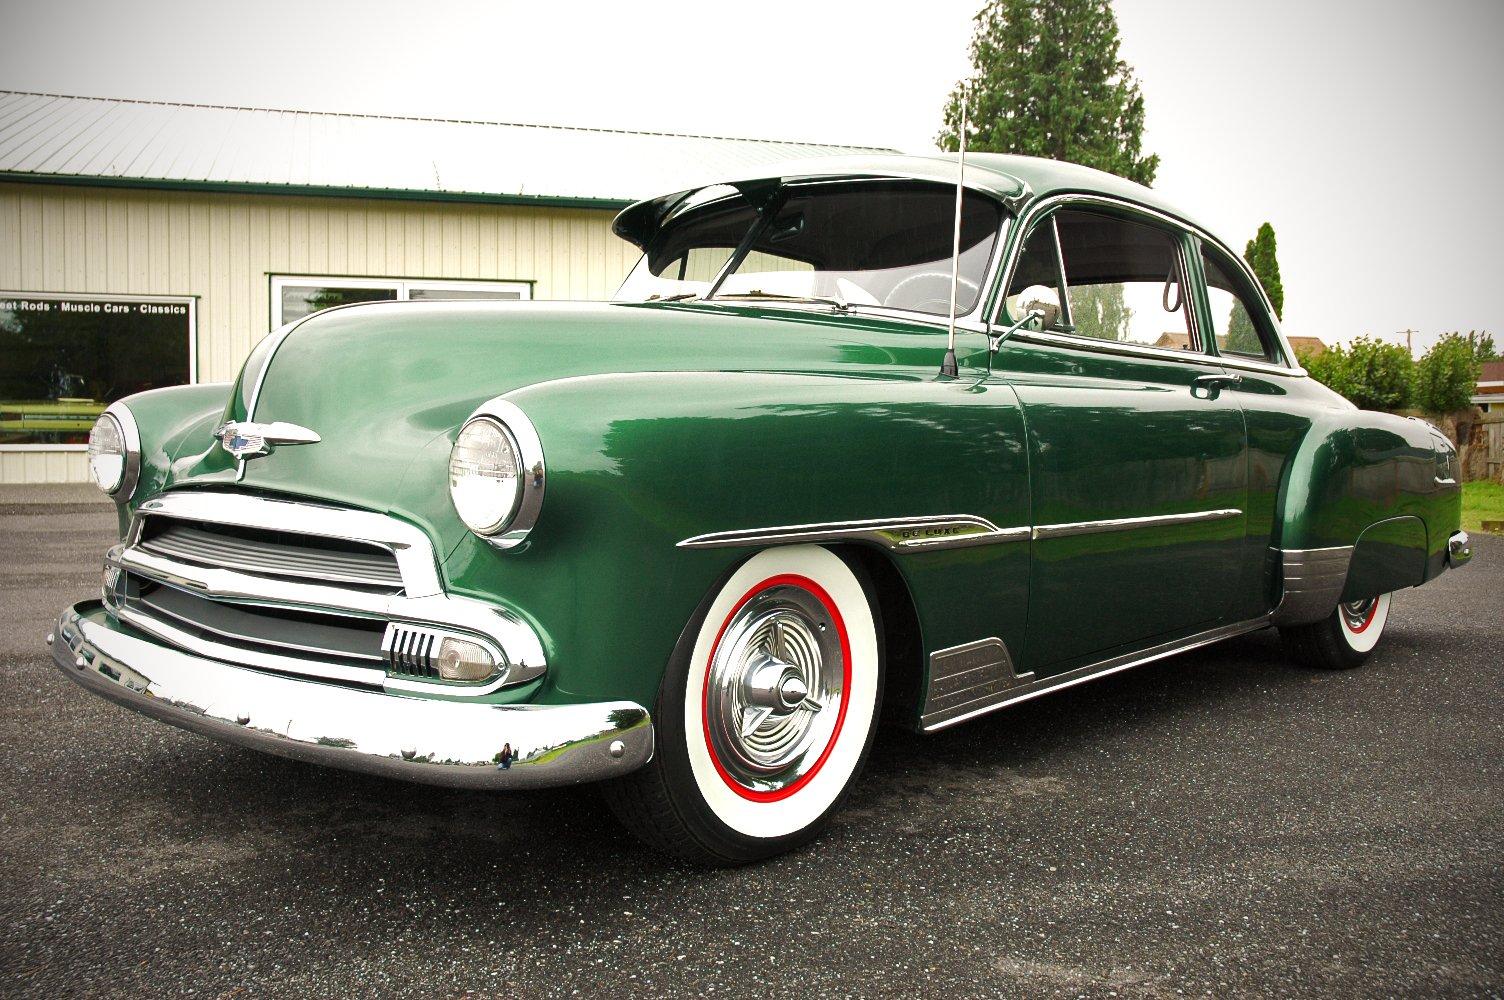 1951 Chevrolet Deluxe Coupe Custom Hotrod Hot Rod Old School Usa 1500x1000 11 Wallpaper 1504x1000 926460 Wallpaperup